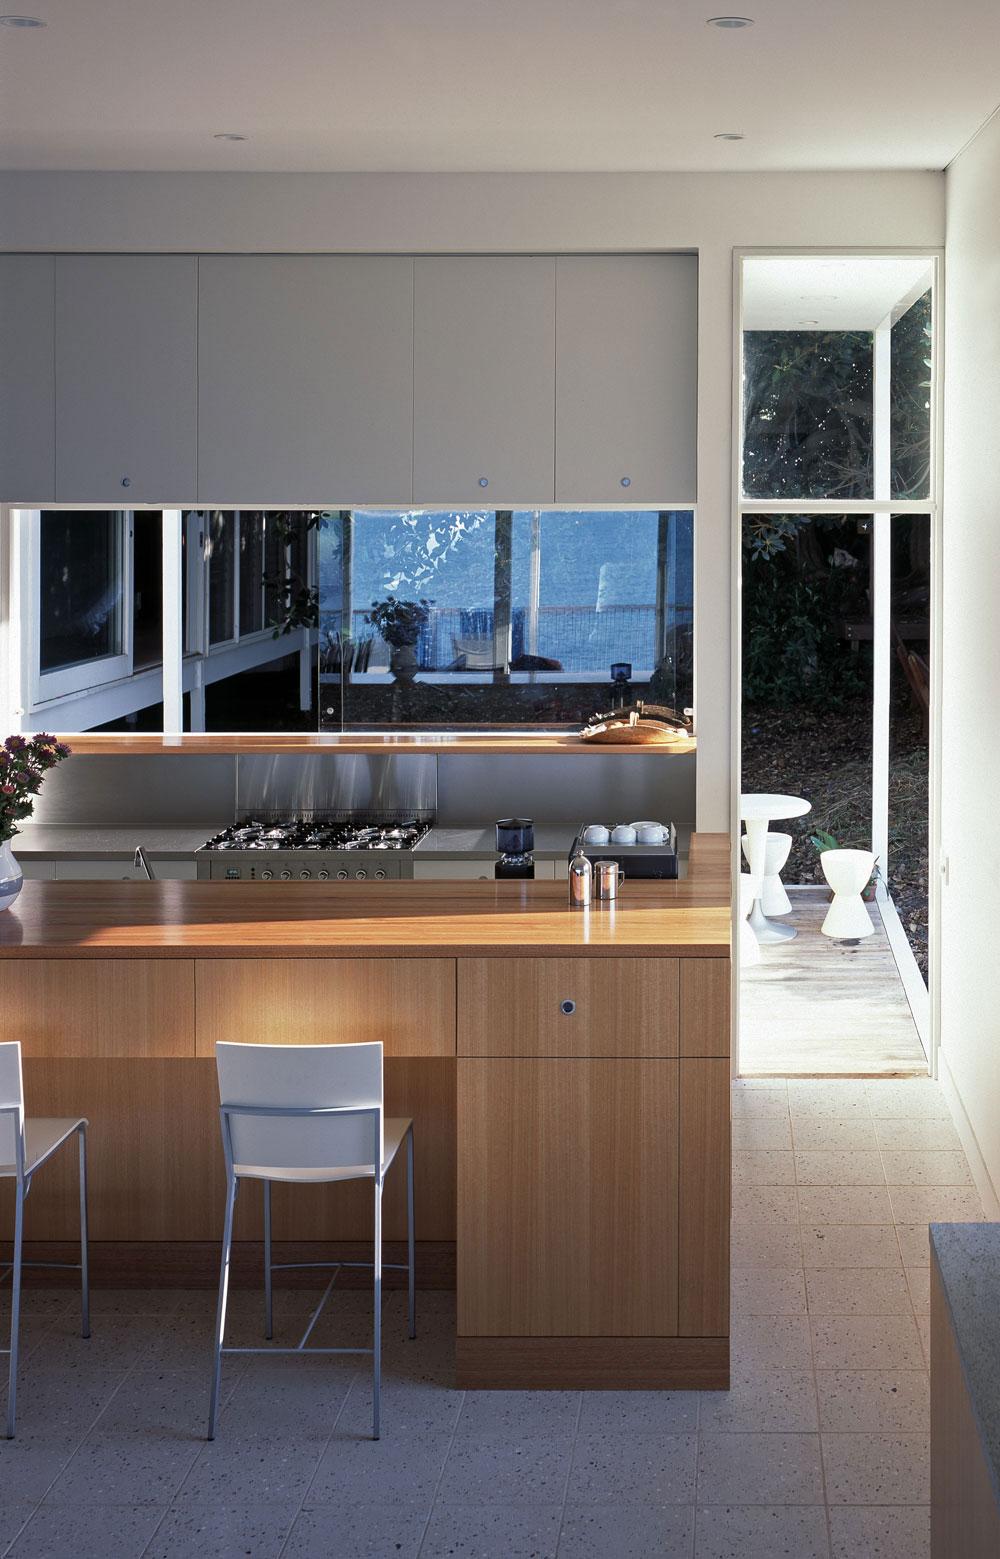 mirrored backsplash in the kitchen viskas apie interjer pwscott com mirrored backsplash